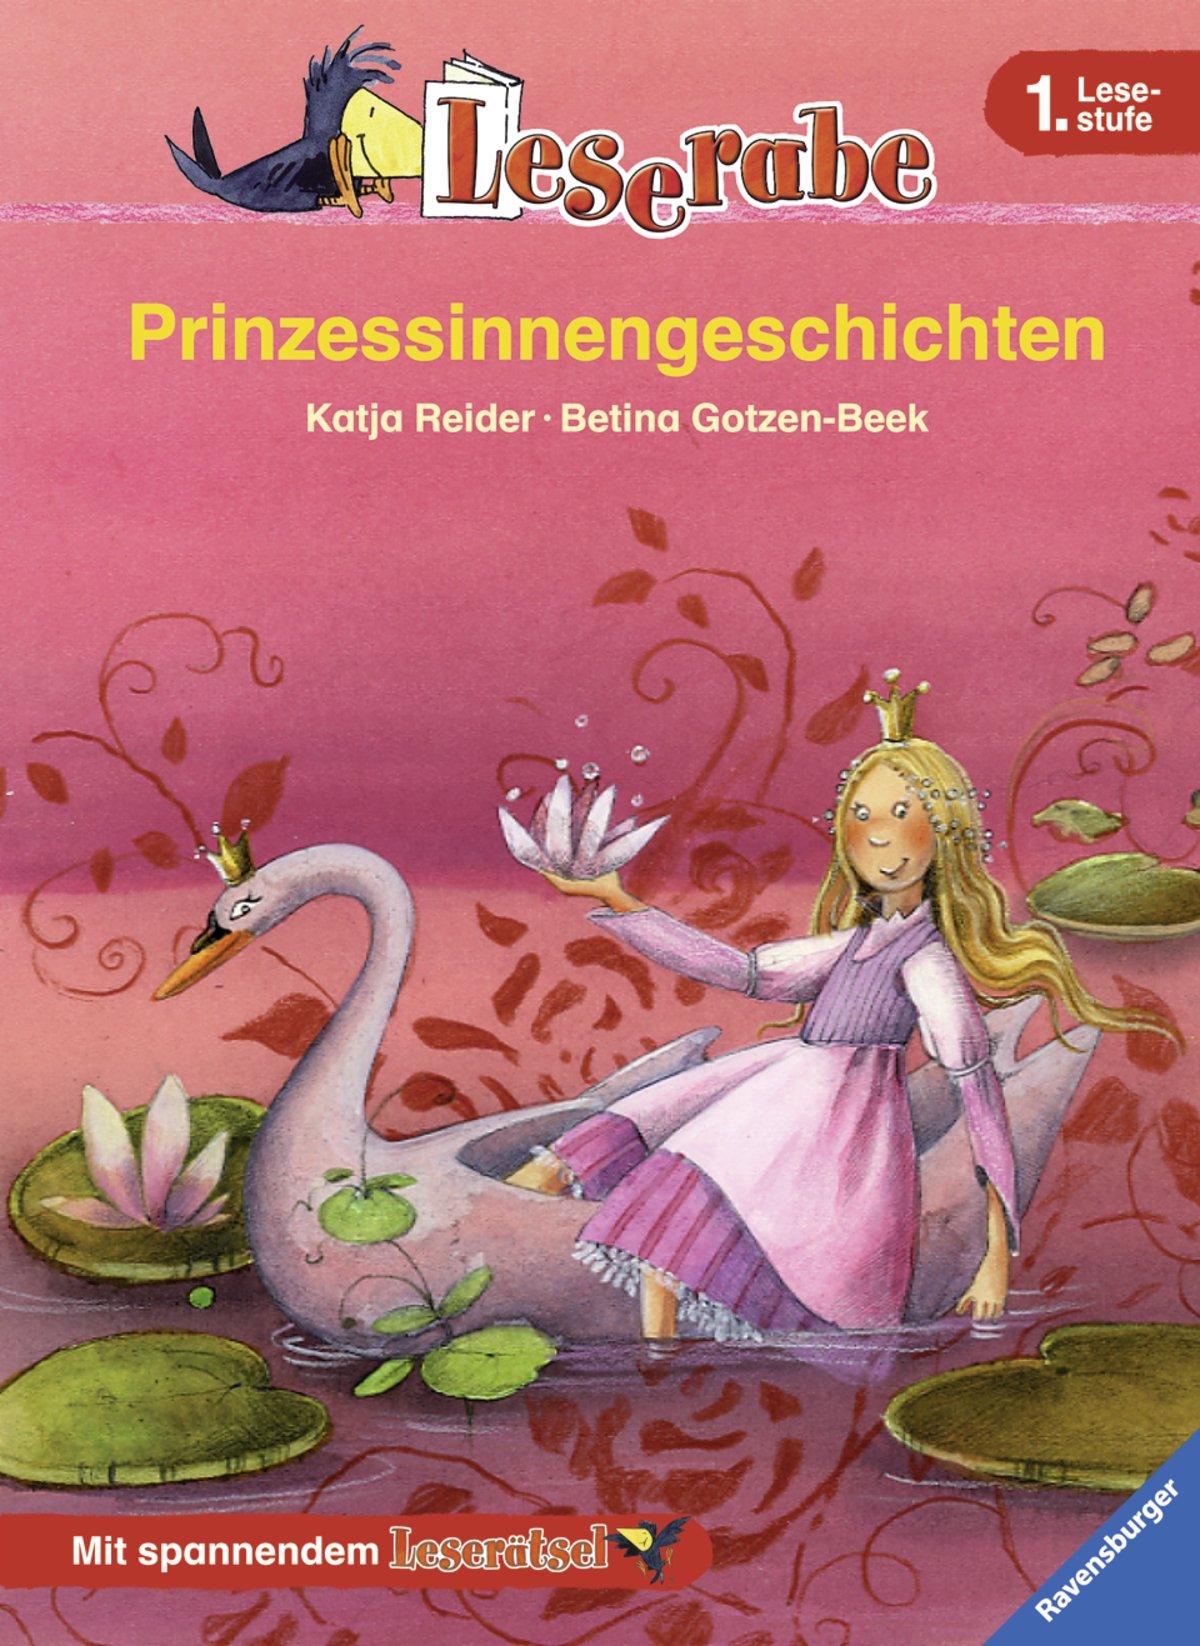 Prinzessinnengeschichten (Leserabe - 1. Lesestufe)